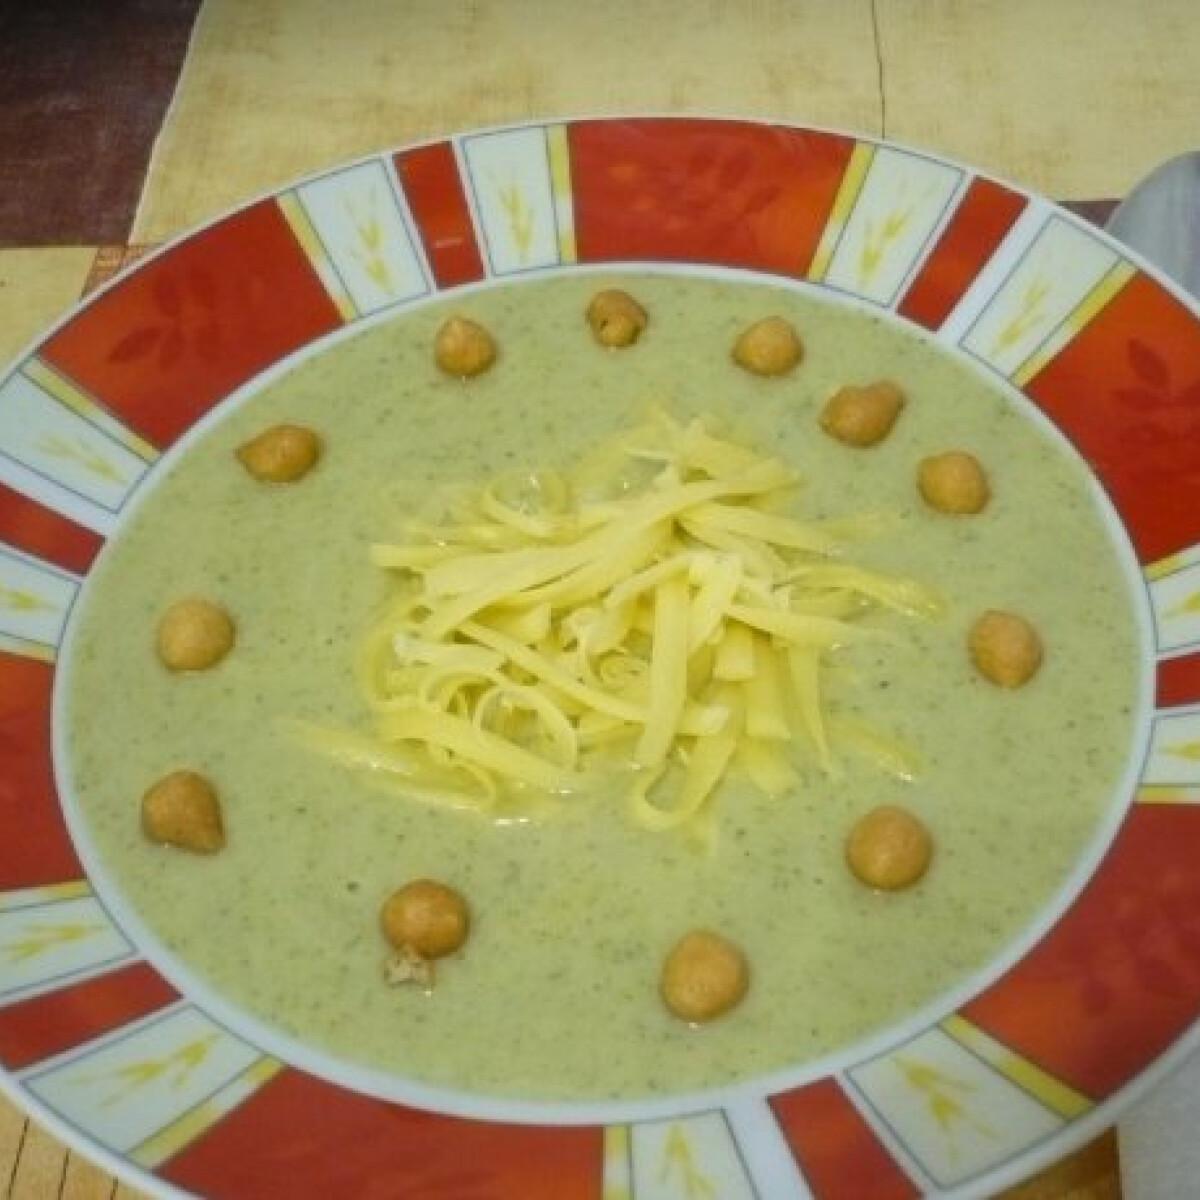 Gyors sajtos brokkolikrémleves